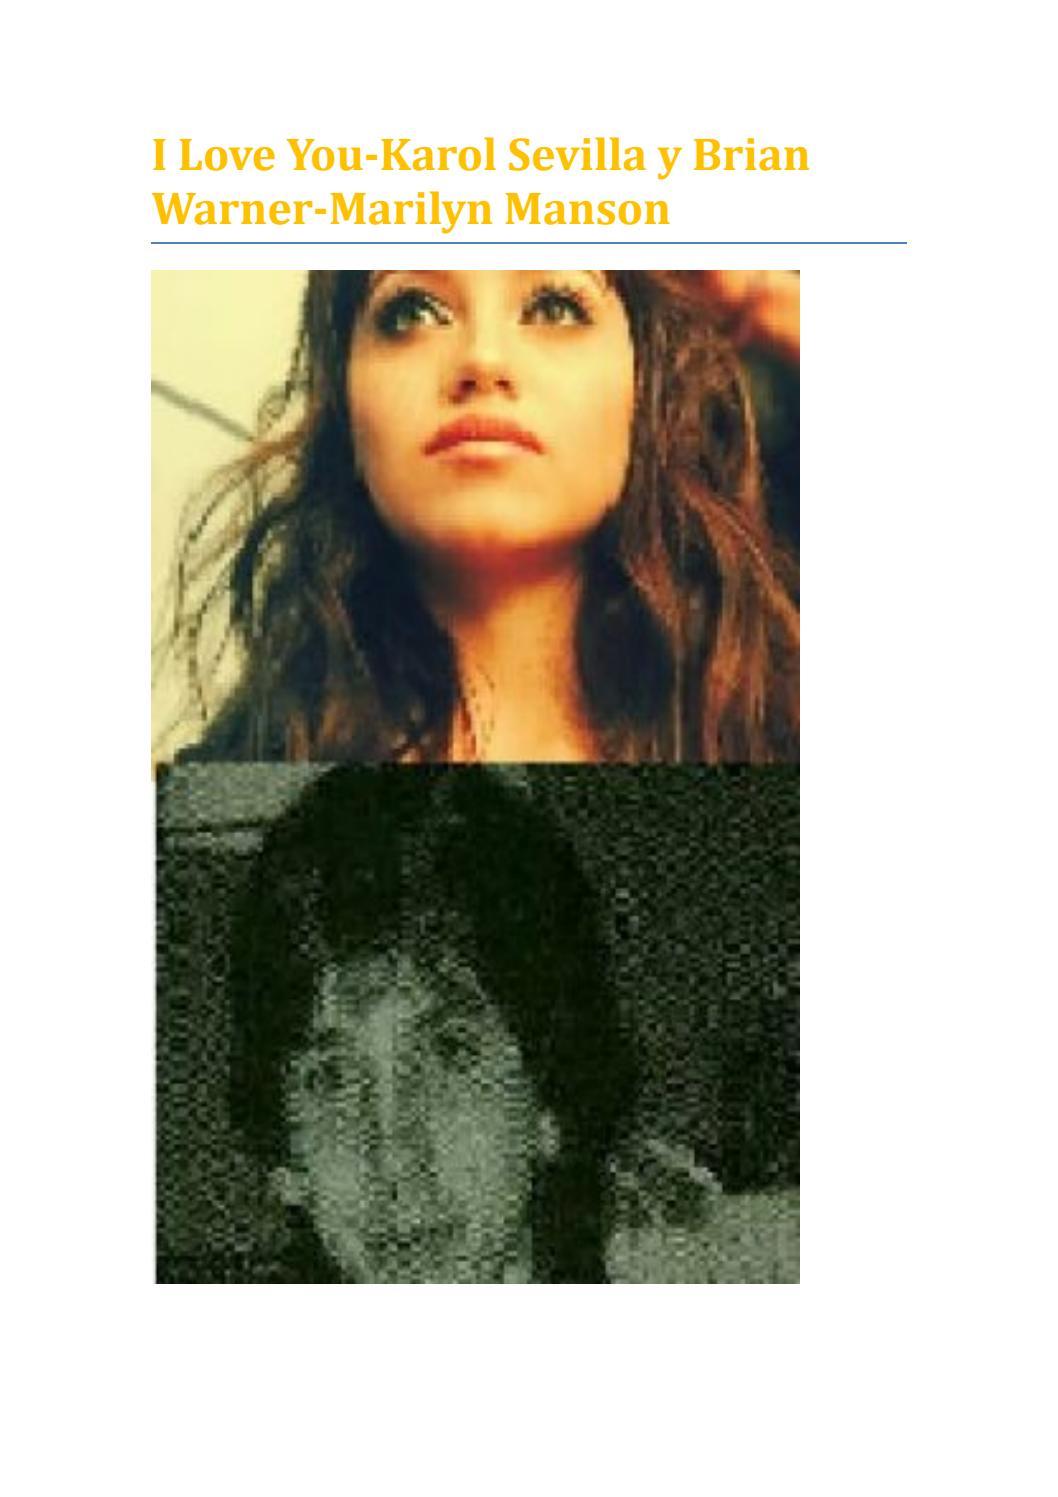 I Love You Karol Sevilla Y Brian Warner Marilyn Manson De Rls